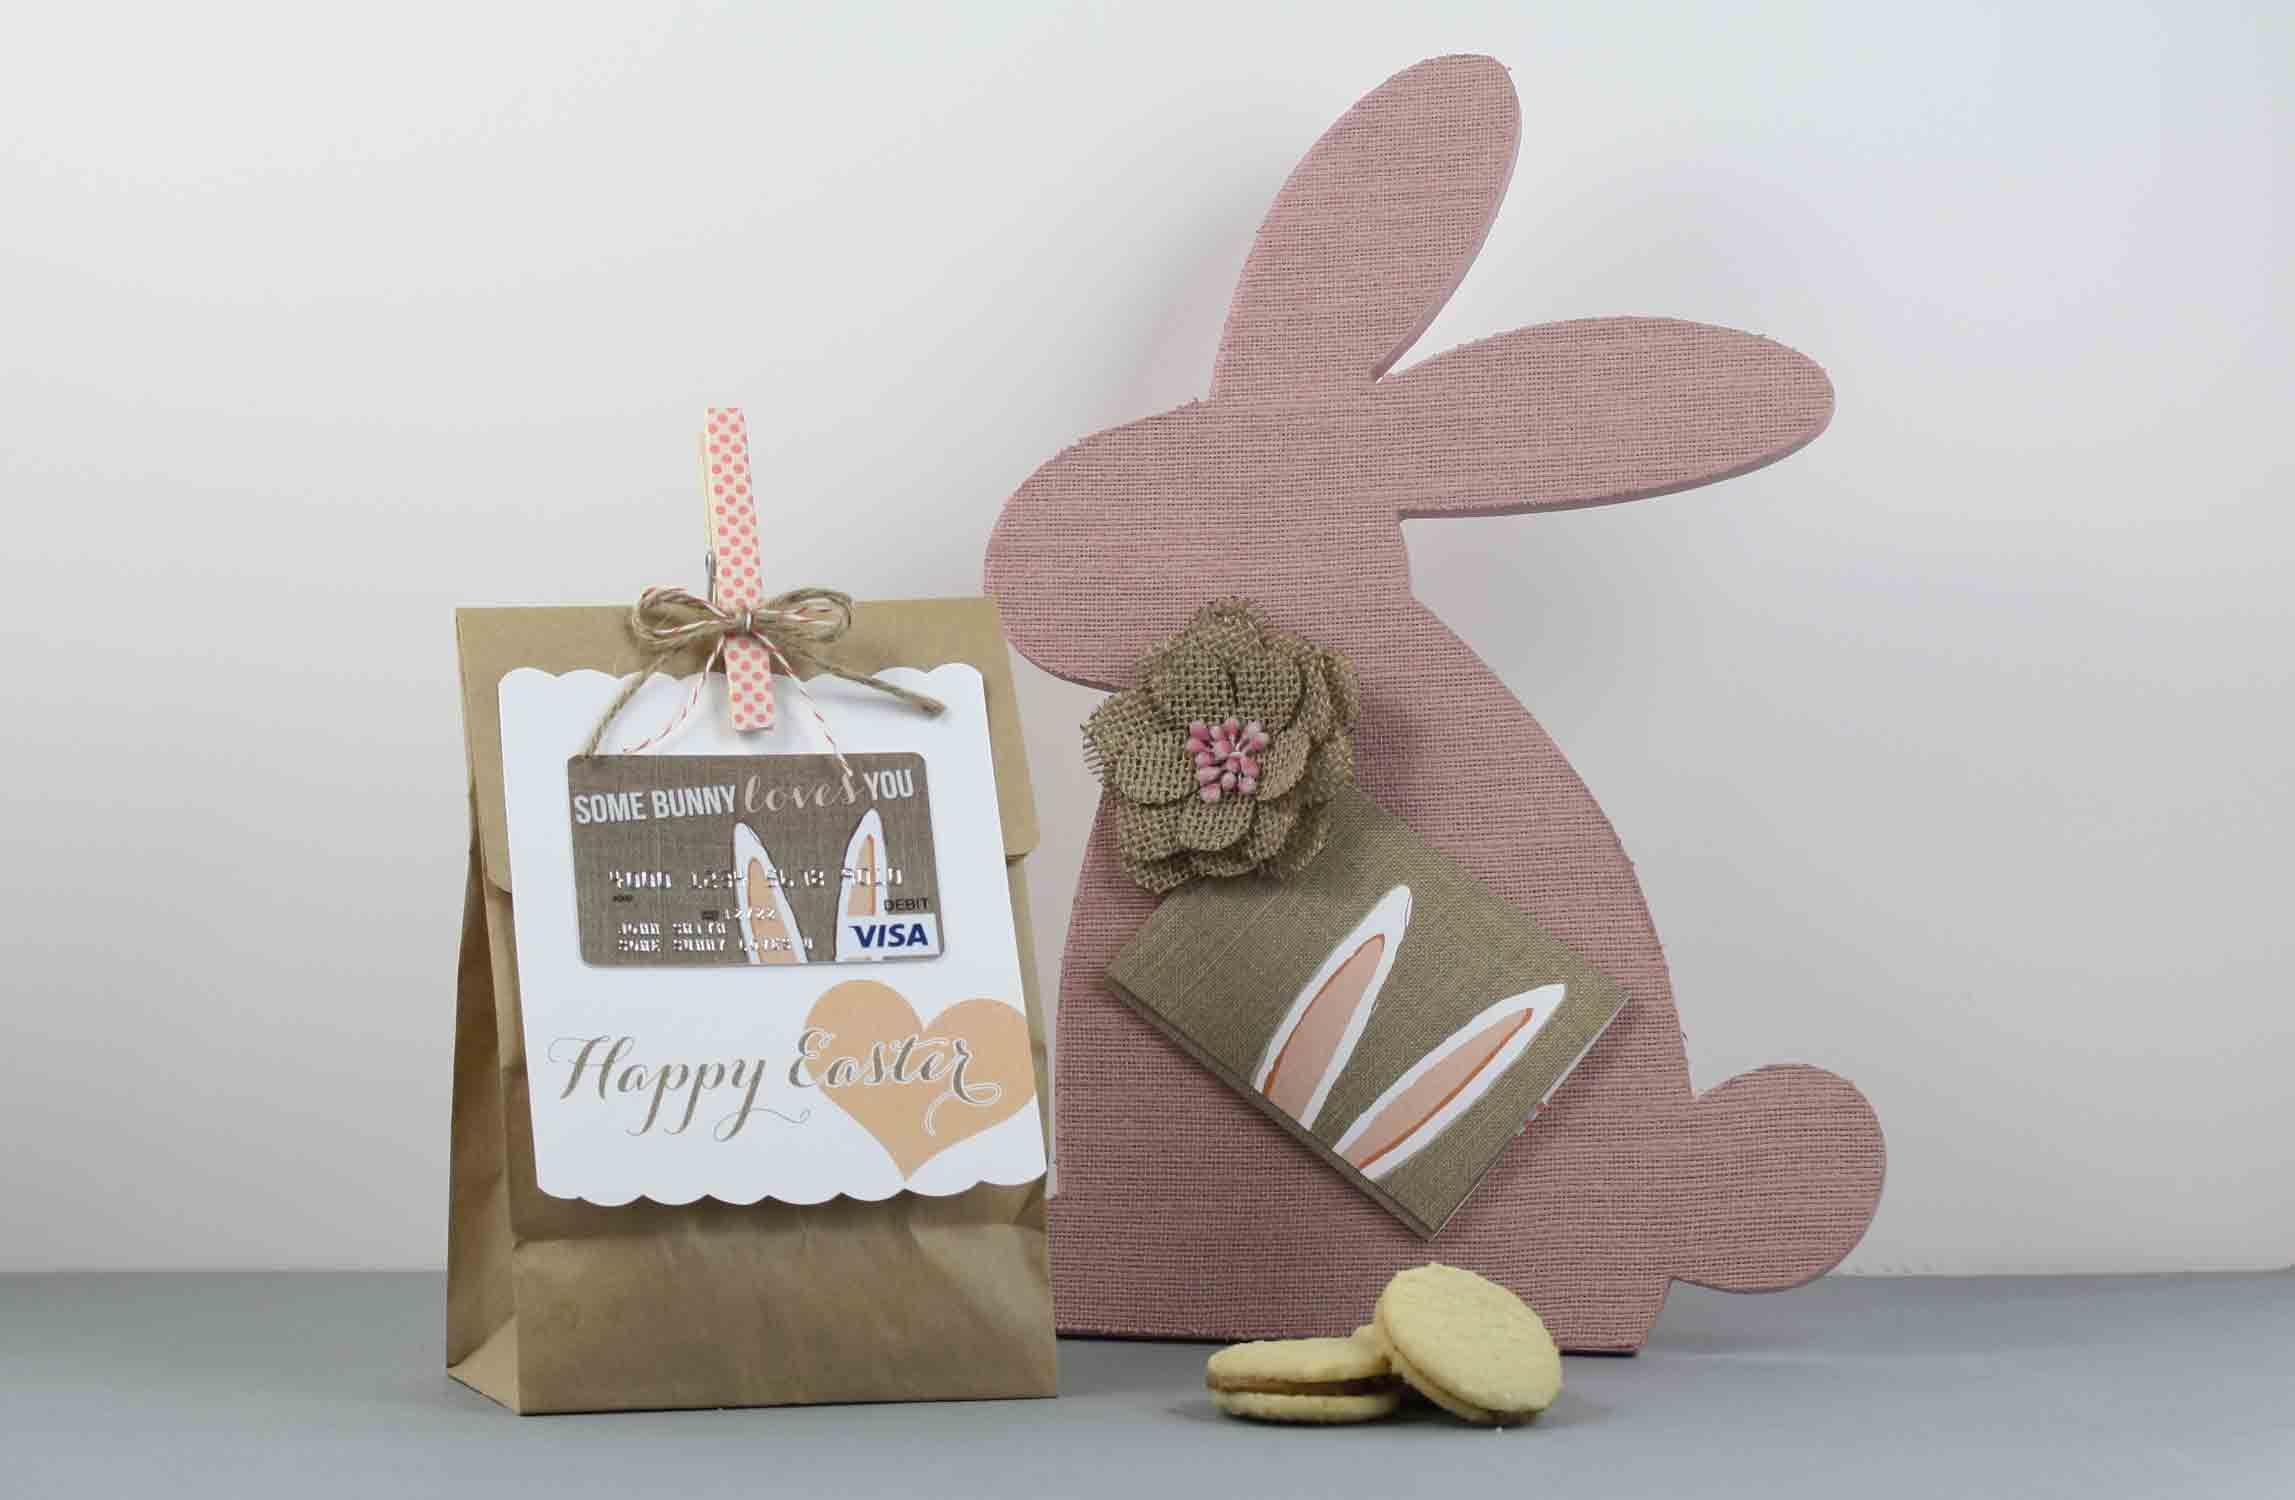 Free easter burlap bunny diy printable gift card holder great free easter burlap bunny diy printable gift card holder great easter gift for friends and negle Choice Image